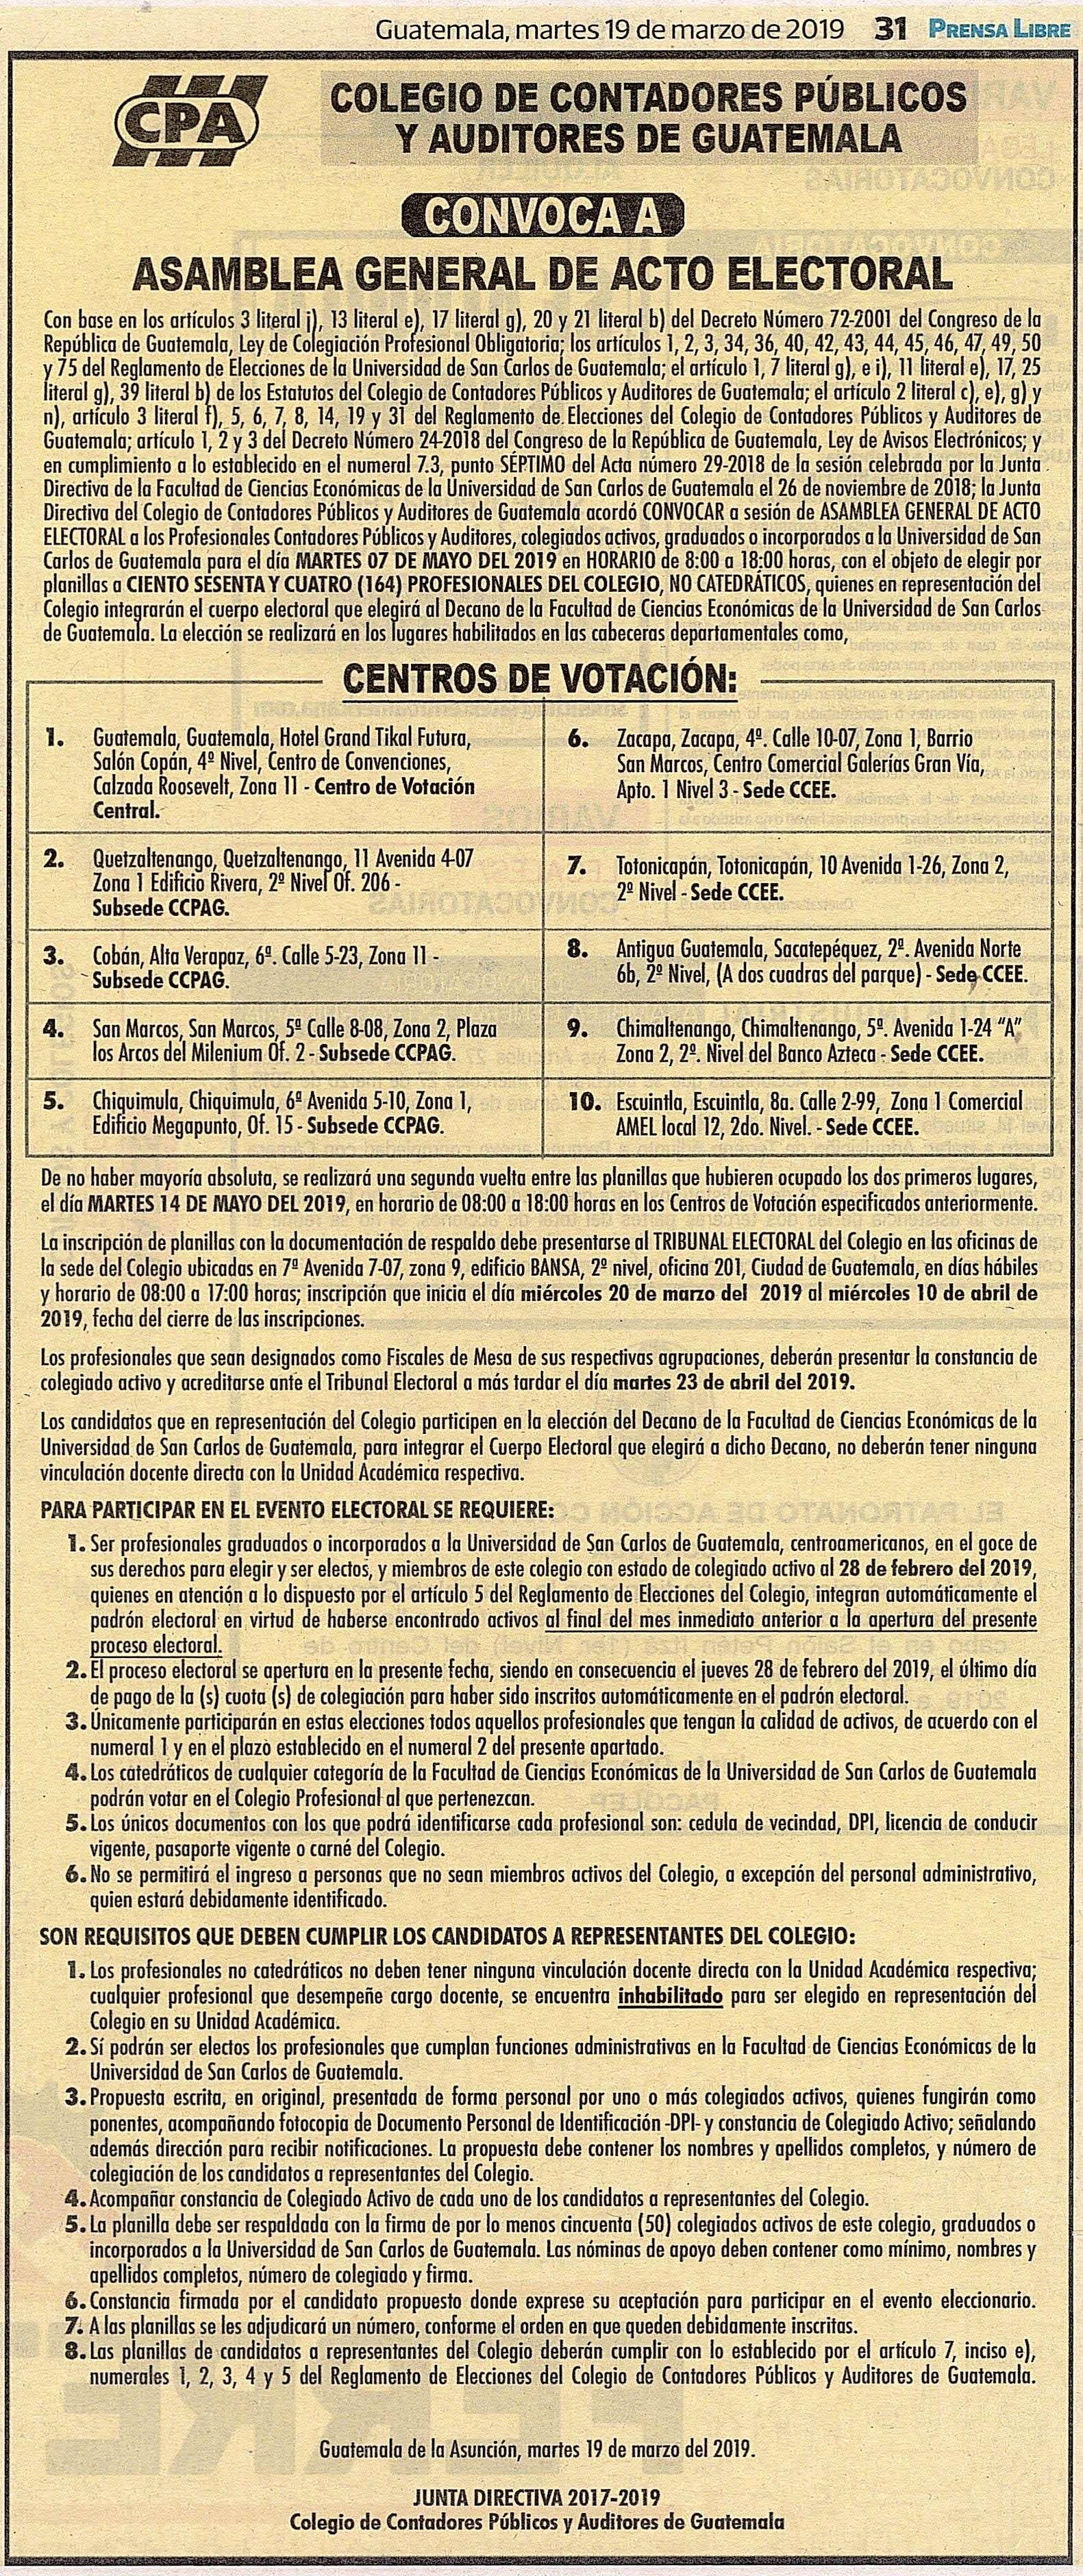 ASAMBLEA GENERAL DE ACTO ELECTORAL